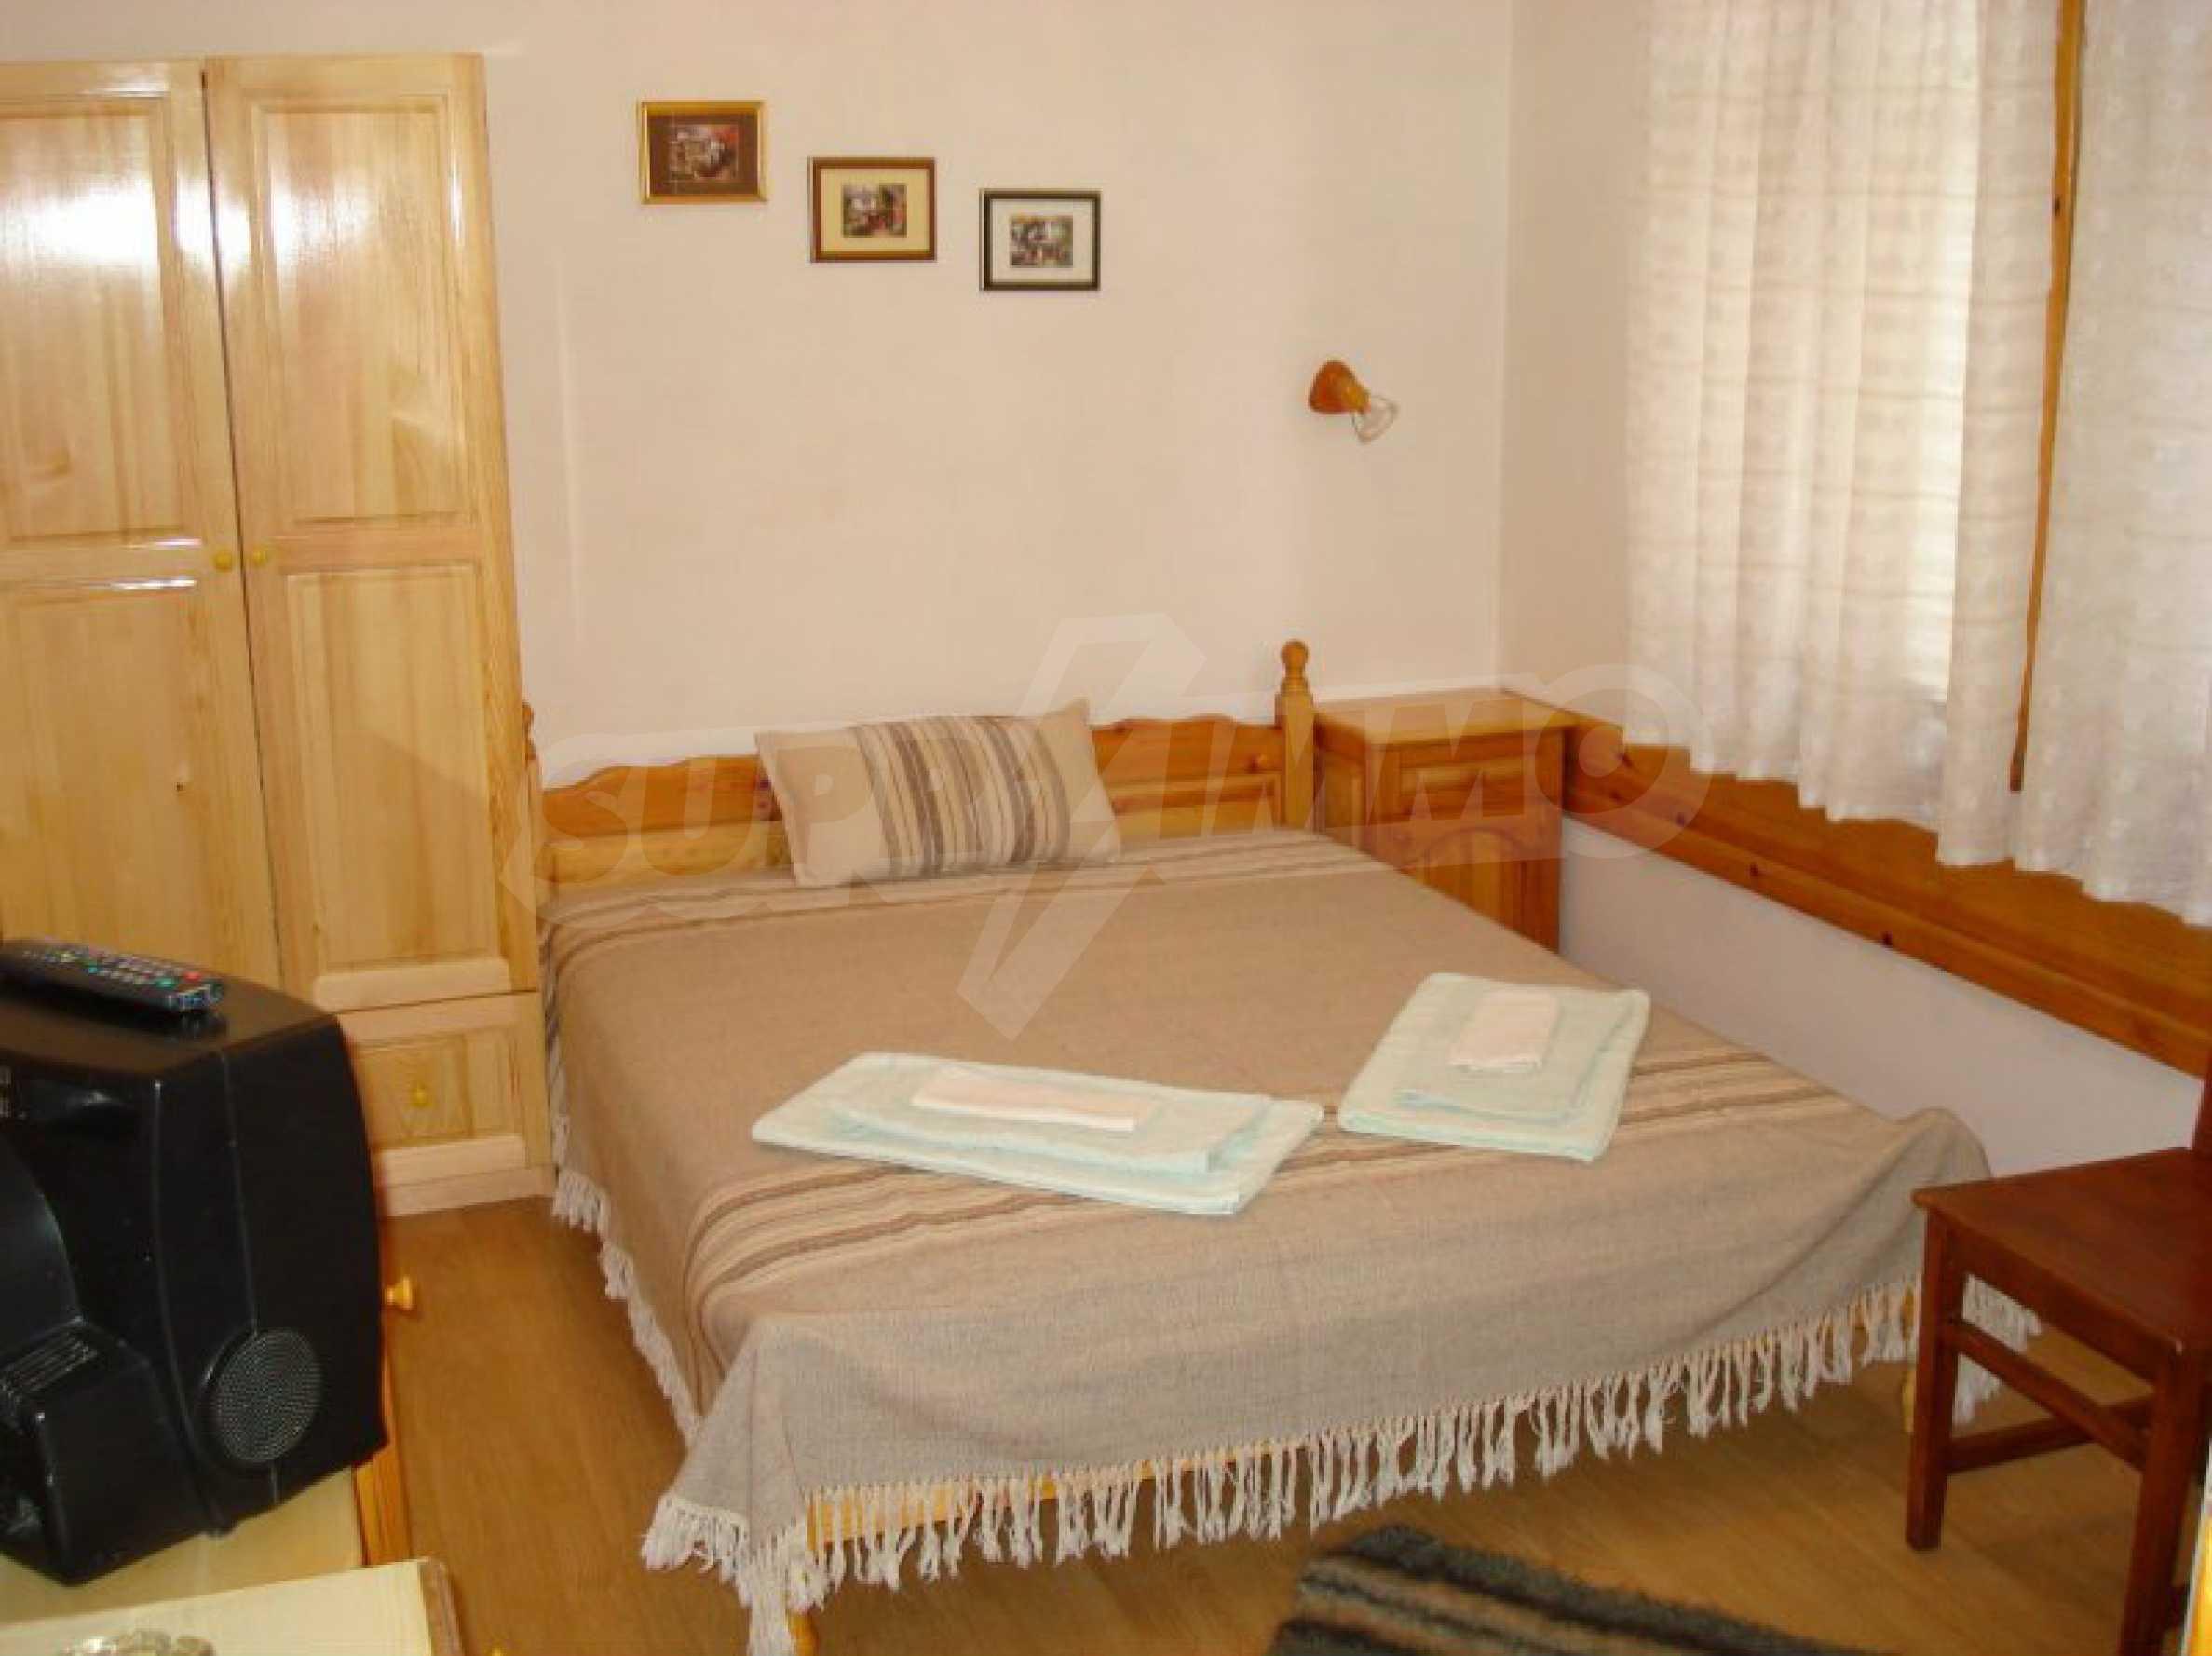 Hotelanlage mit Restaurant am Ufer des Flusses Osam in Lovech 29